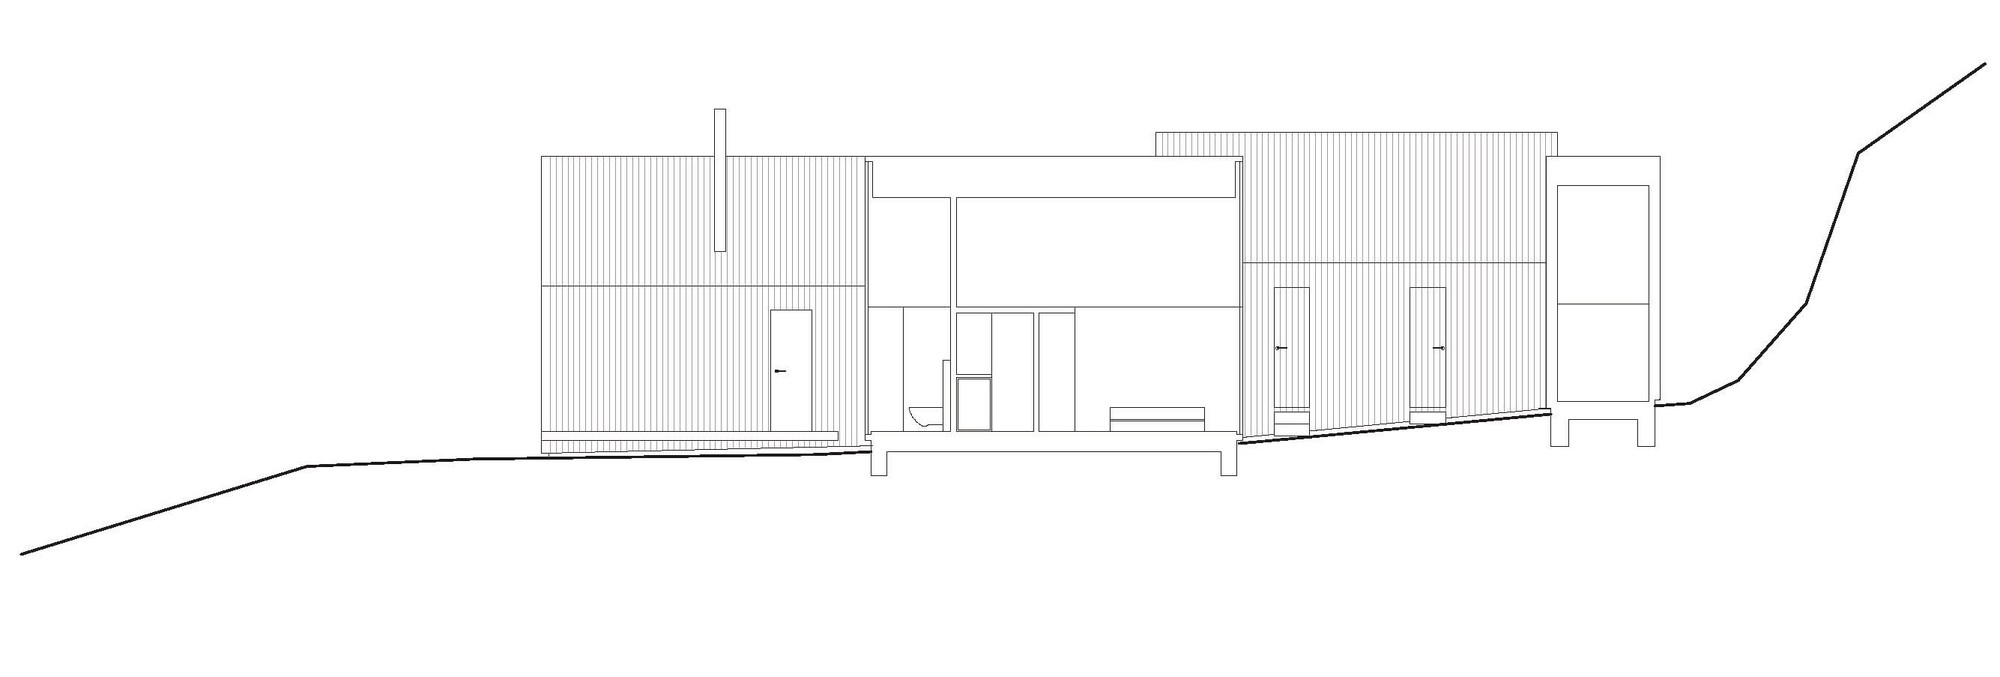 Galeria De Micro Cluster Cabins Reiulf Ramstad